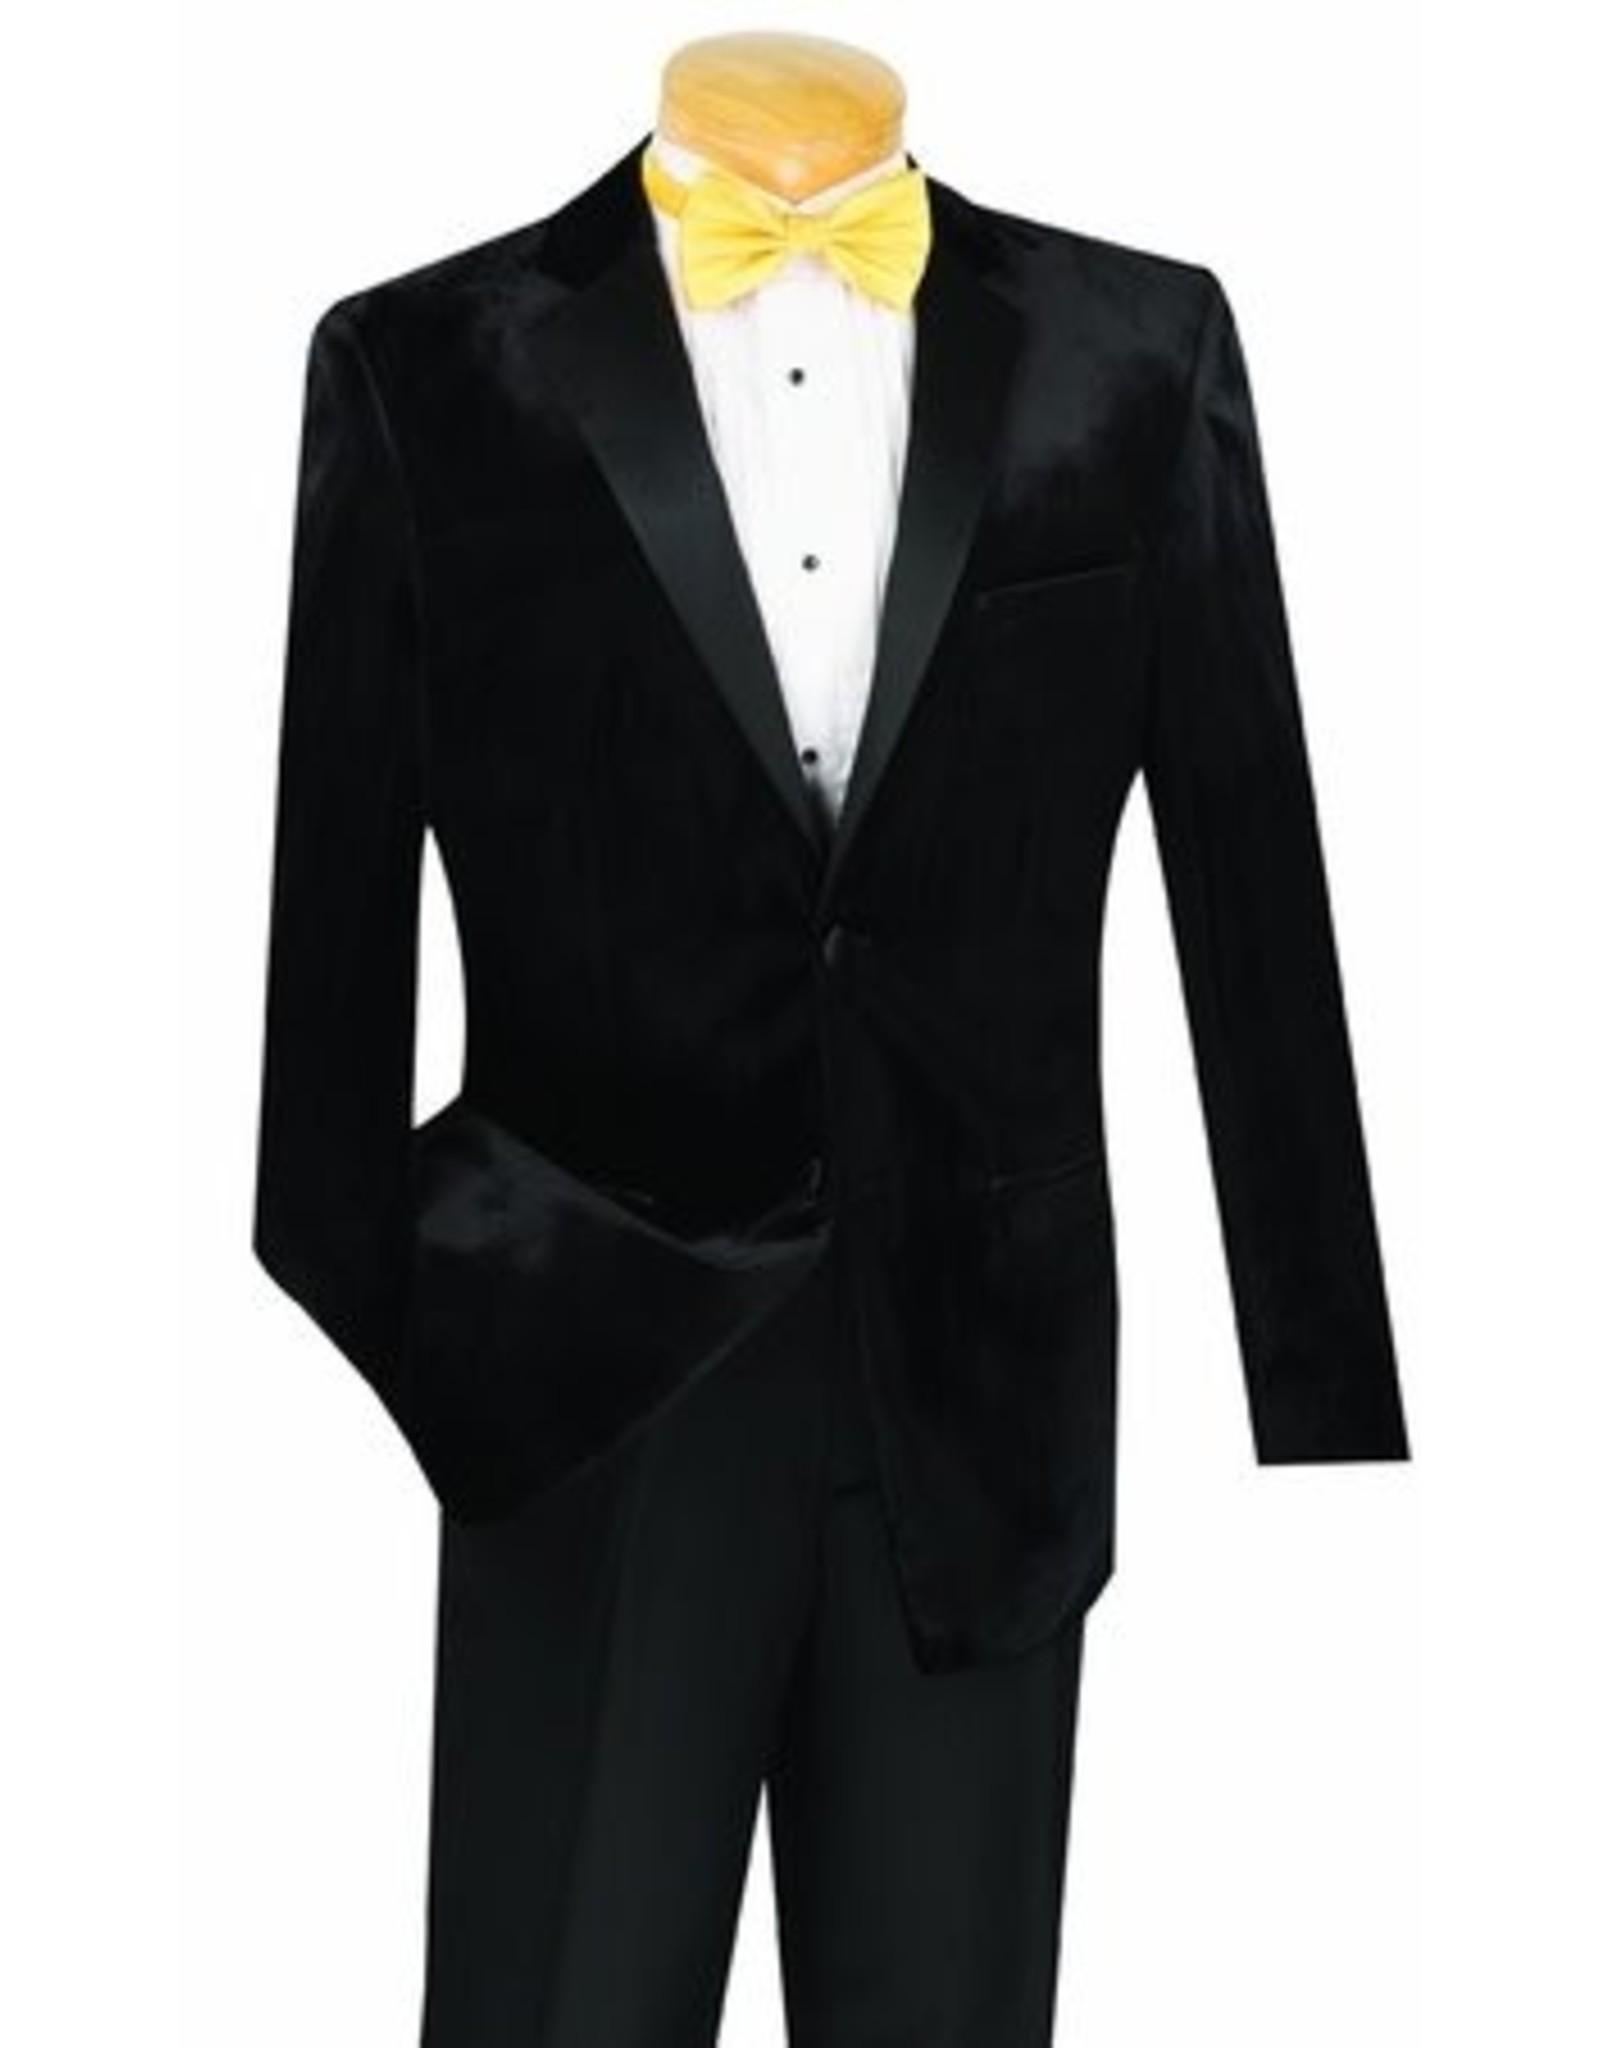 Vinci Vinci Tuxedo - TSV Black